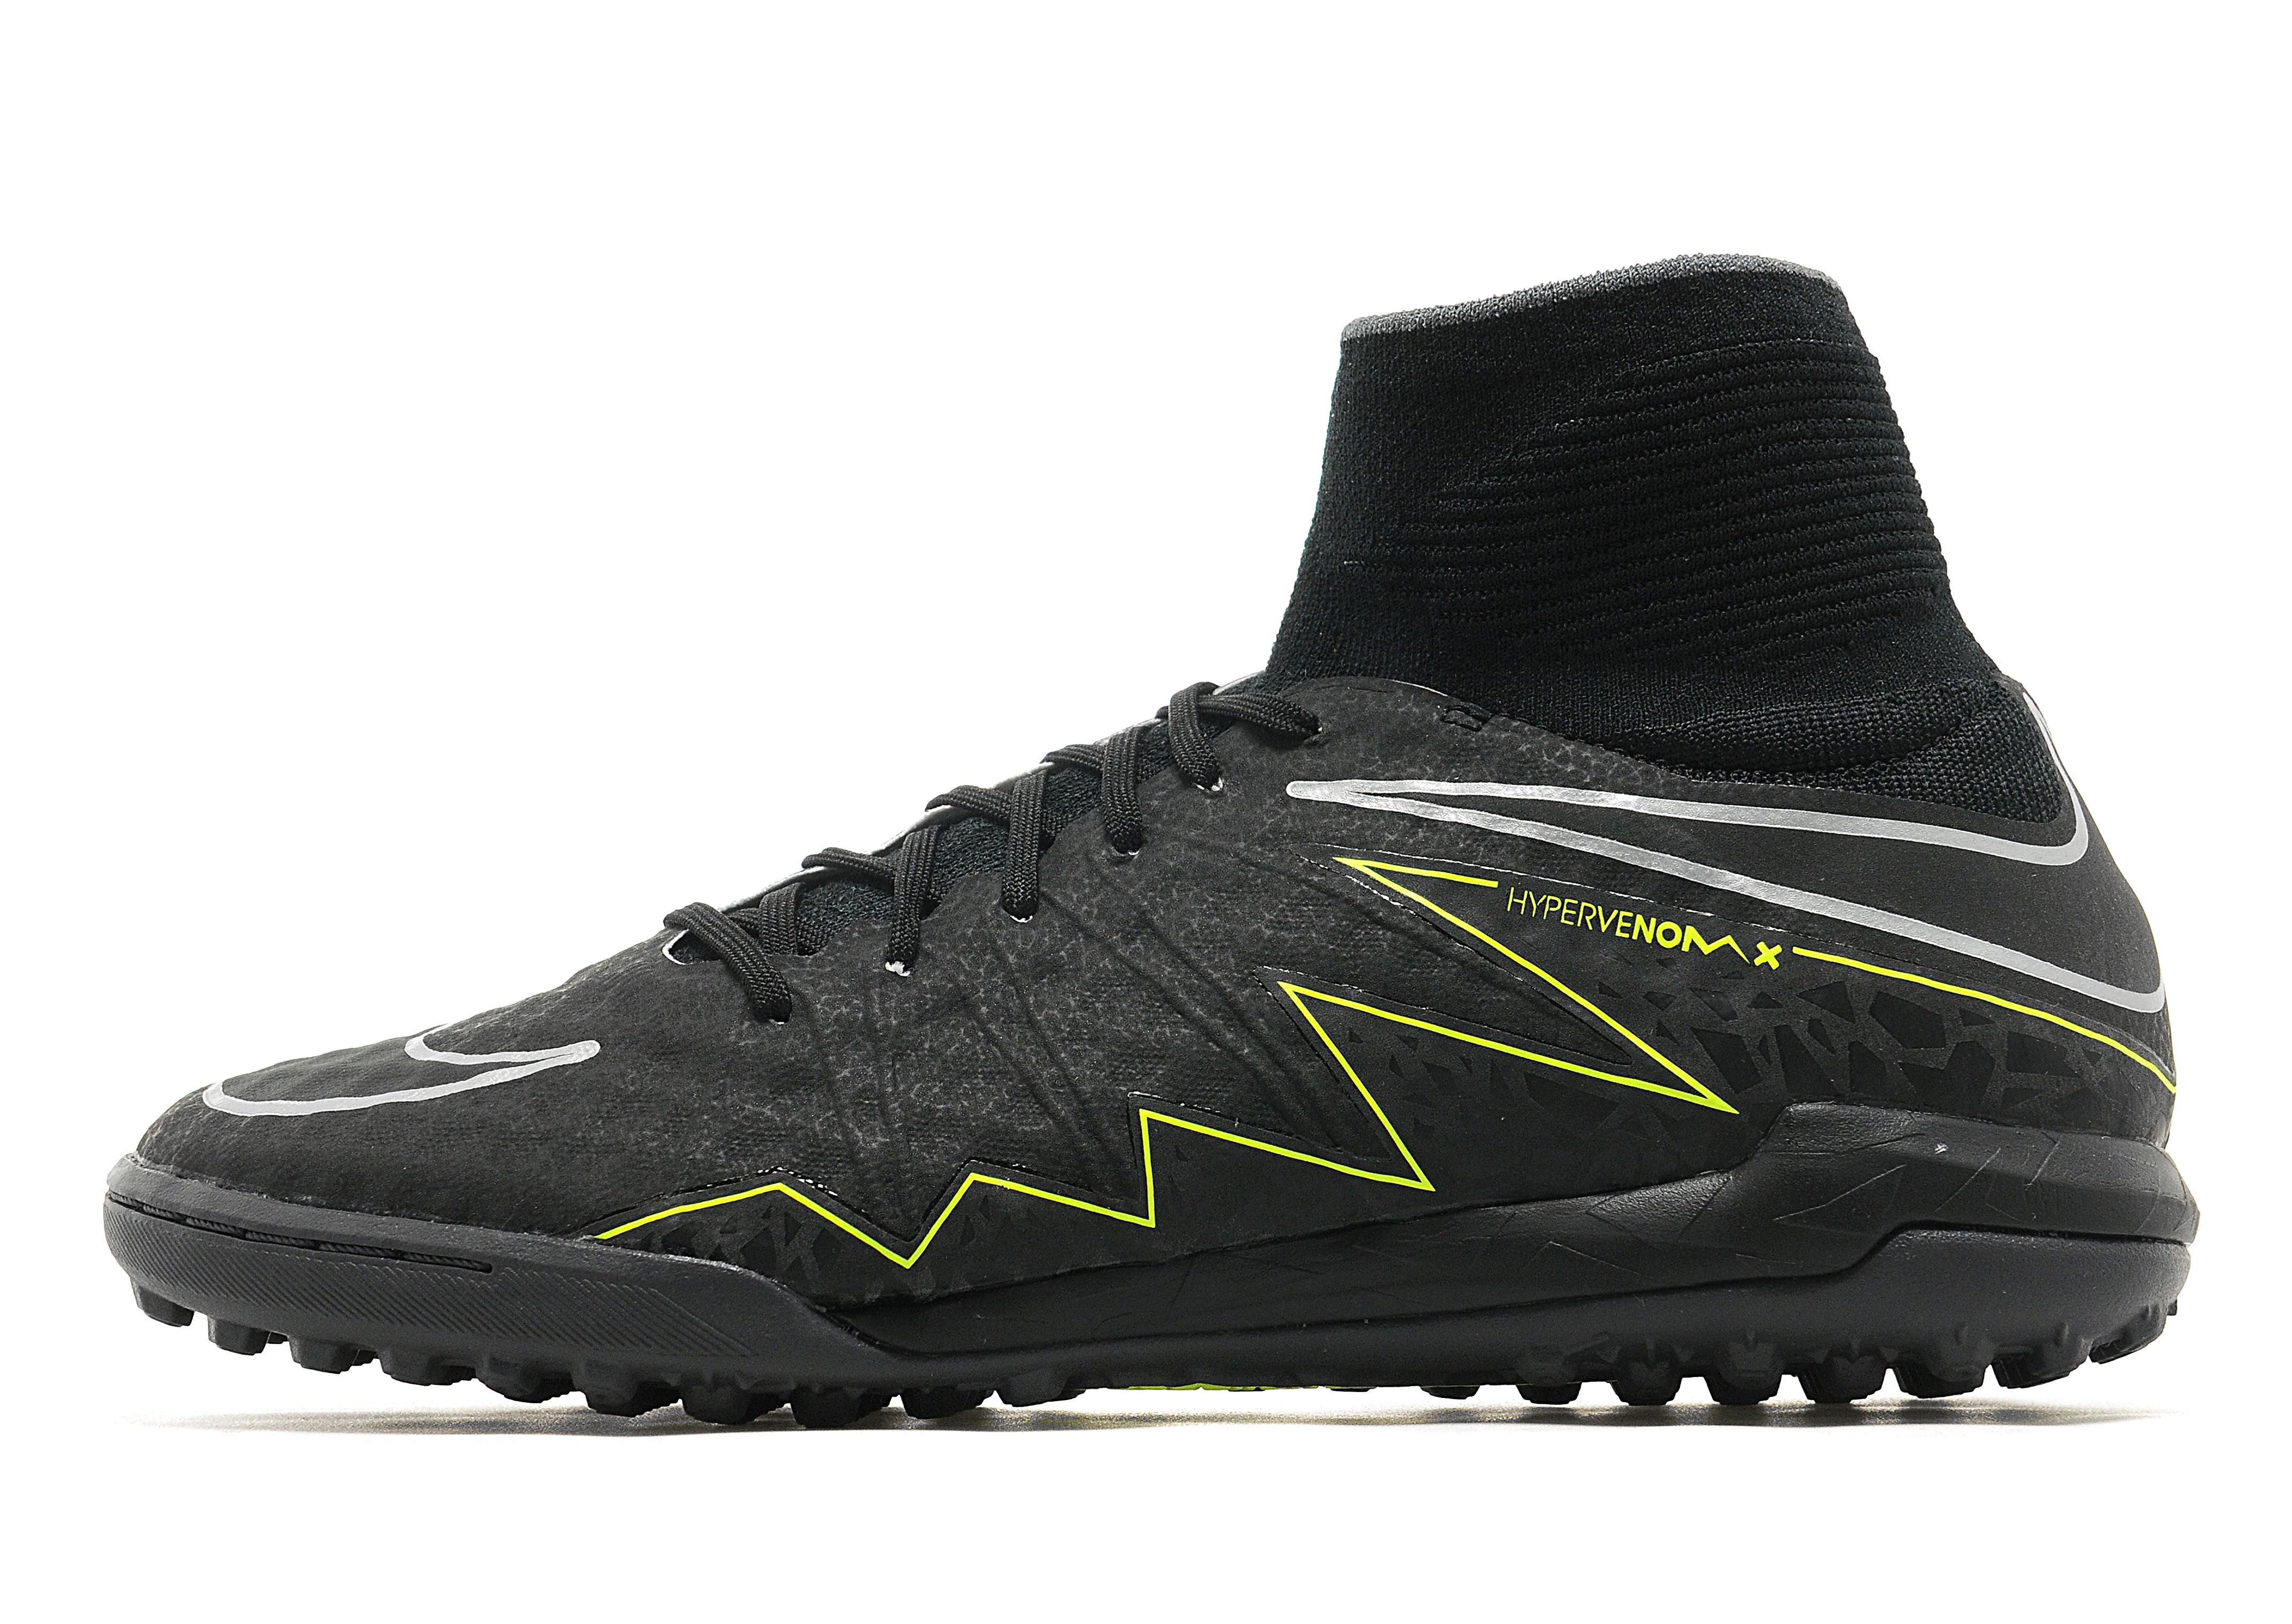 Nike Pitch Dark HypervenomX Proximo II Turf